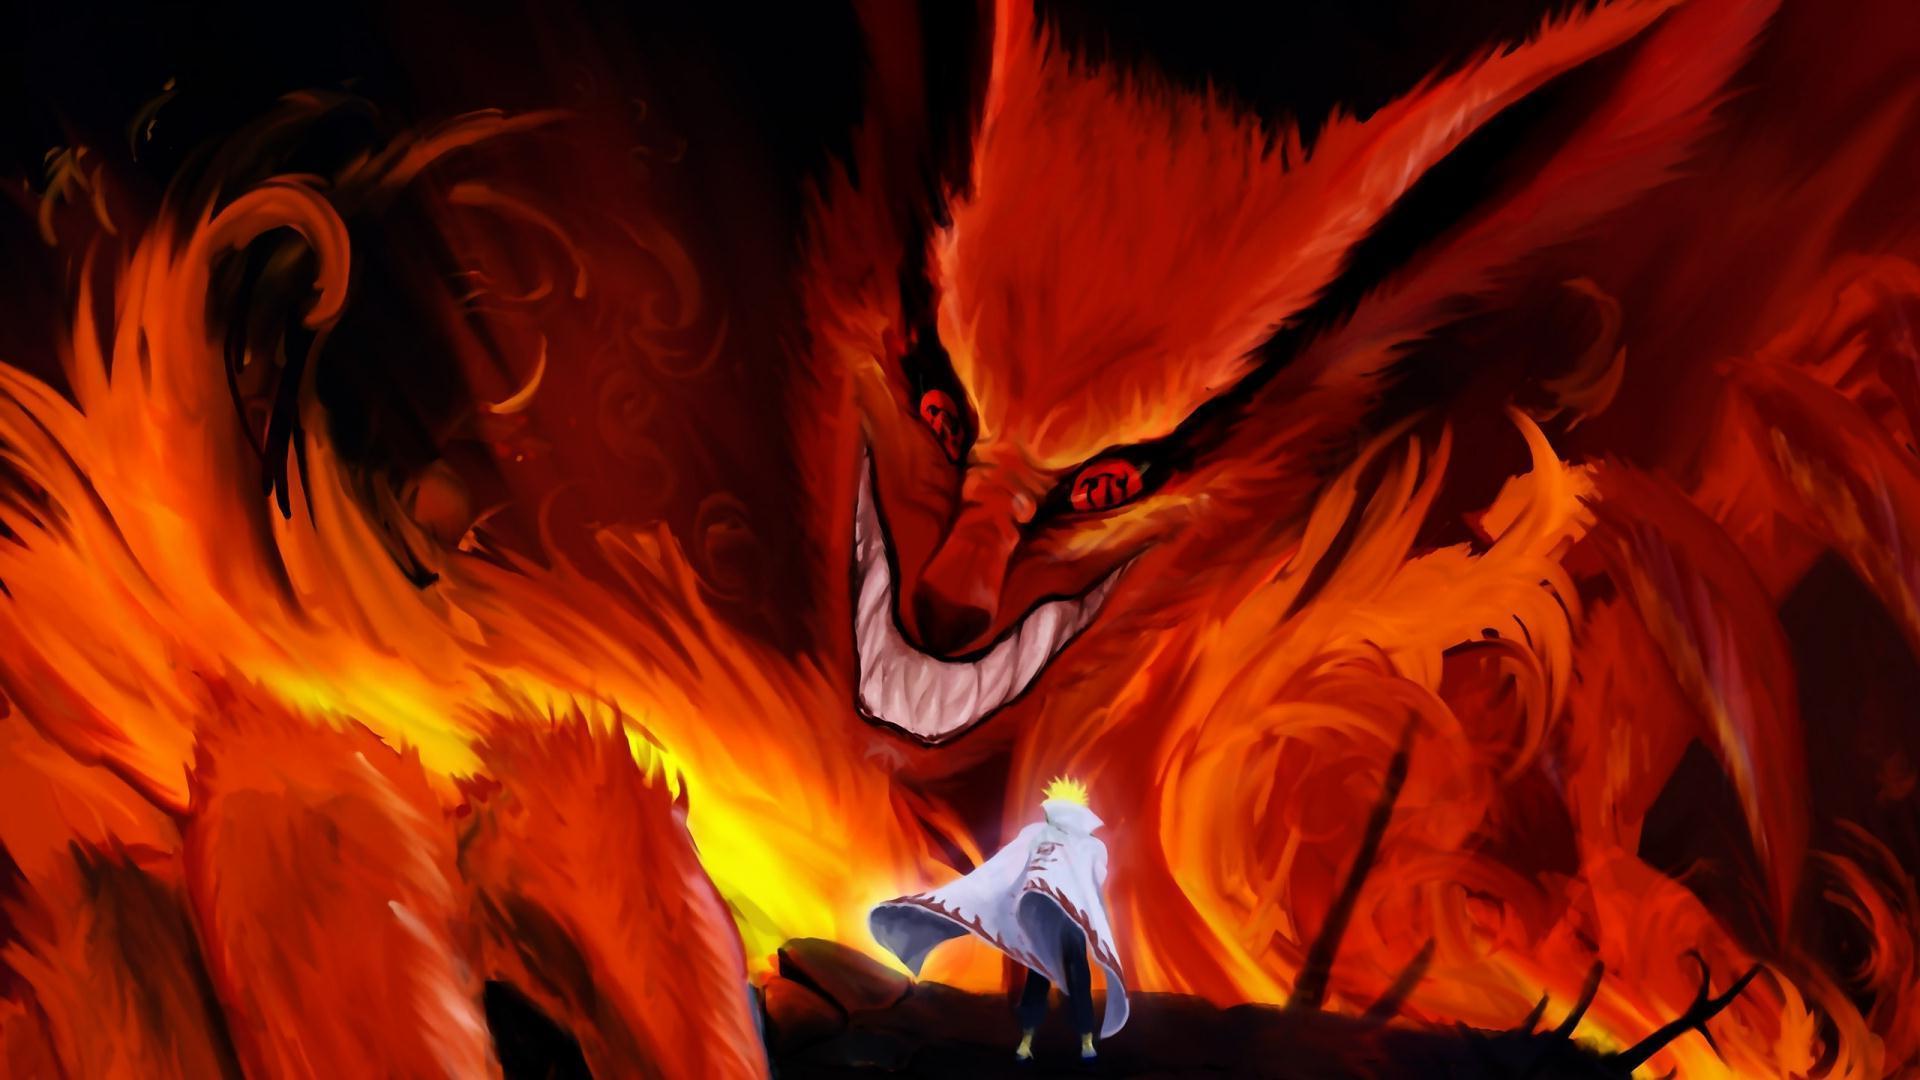 Naruto Hd Wallpapers Top Free Naruto Hd Backgrounds Wallpaperaccess